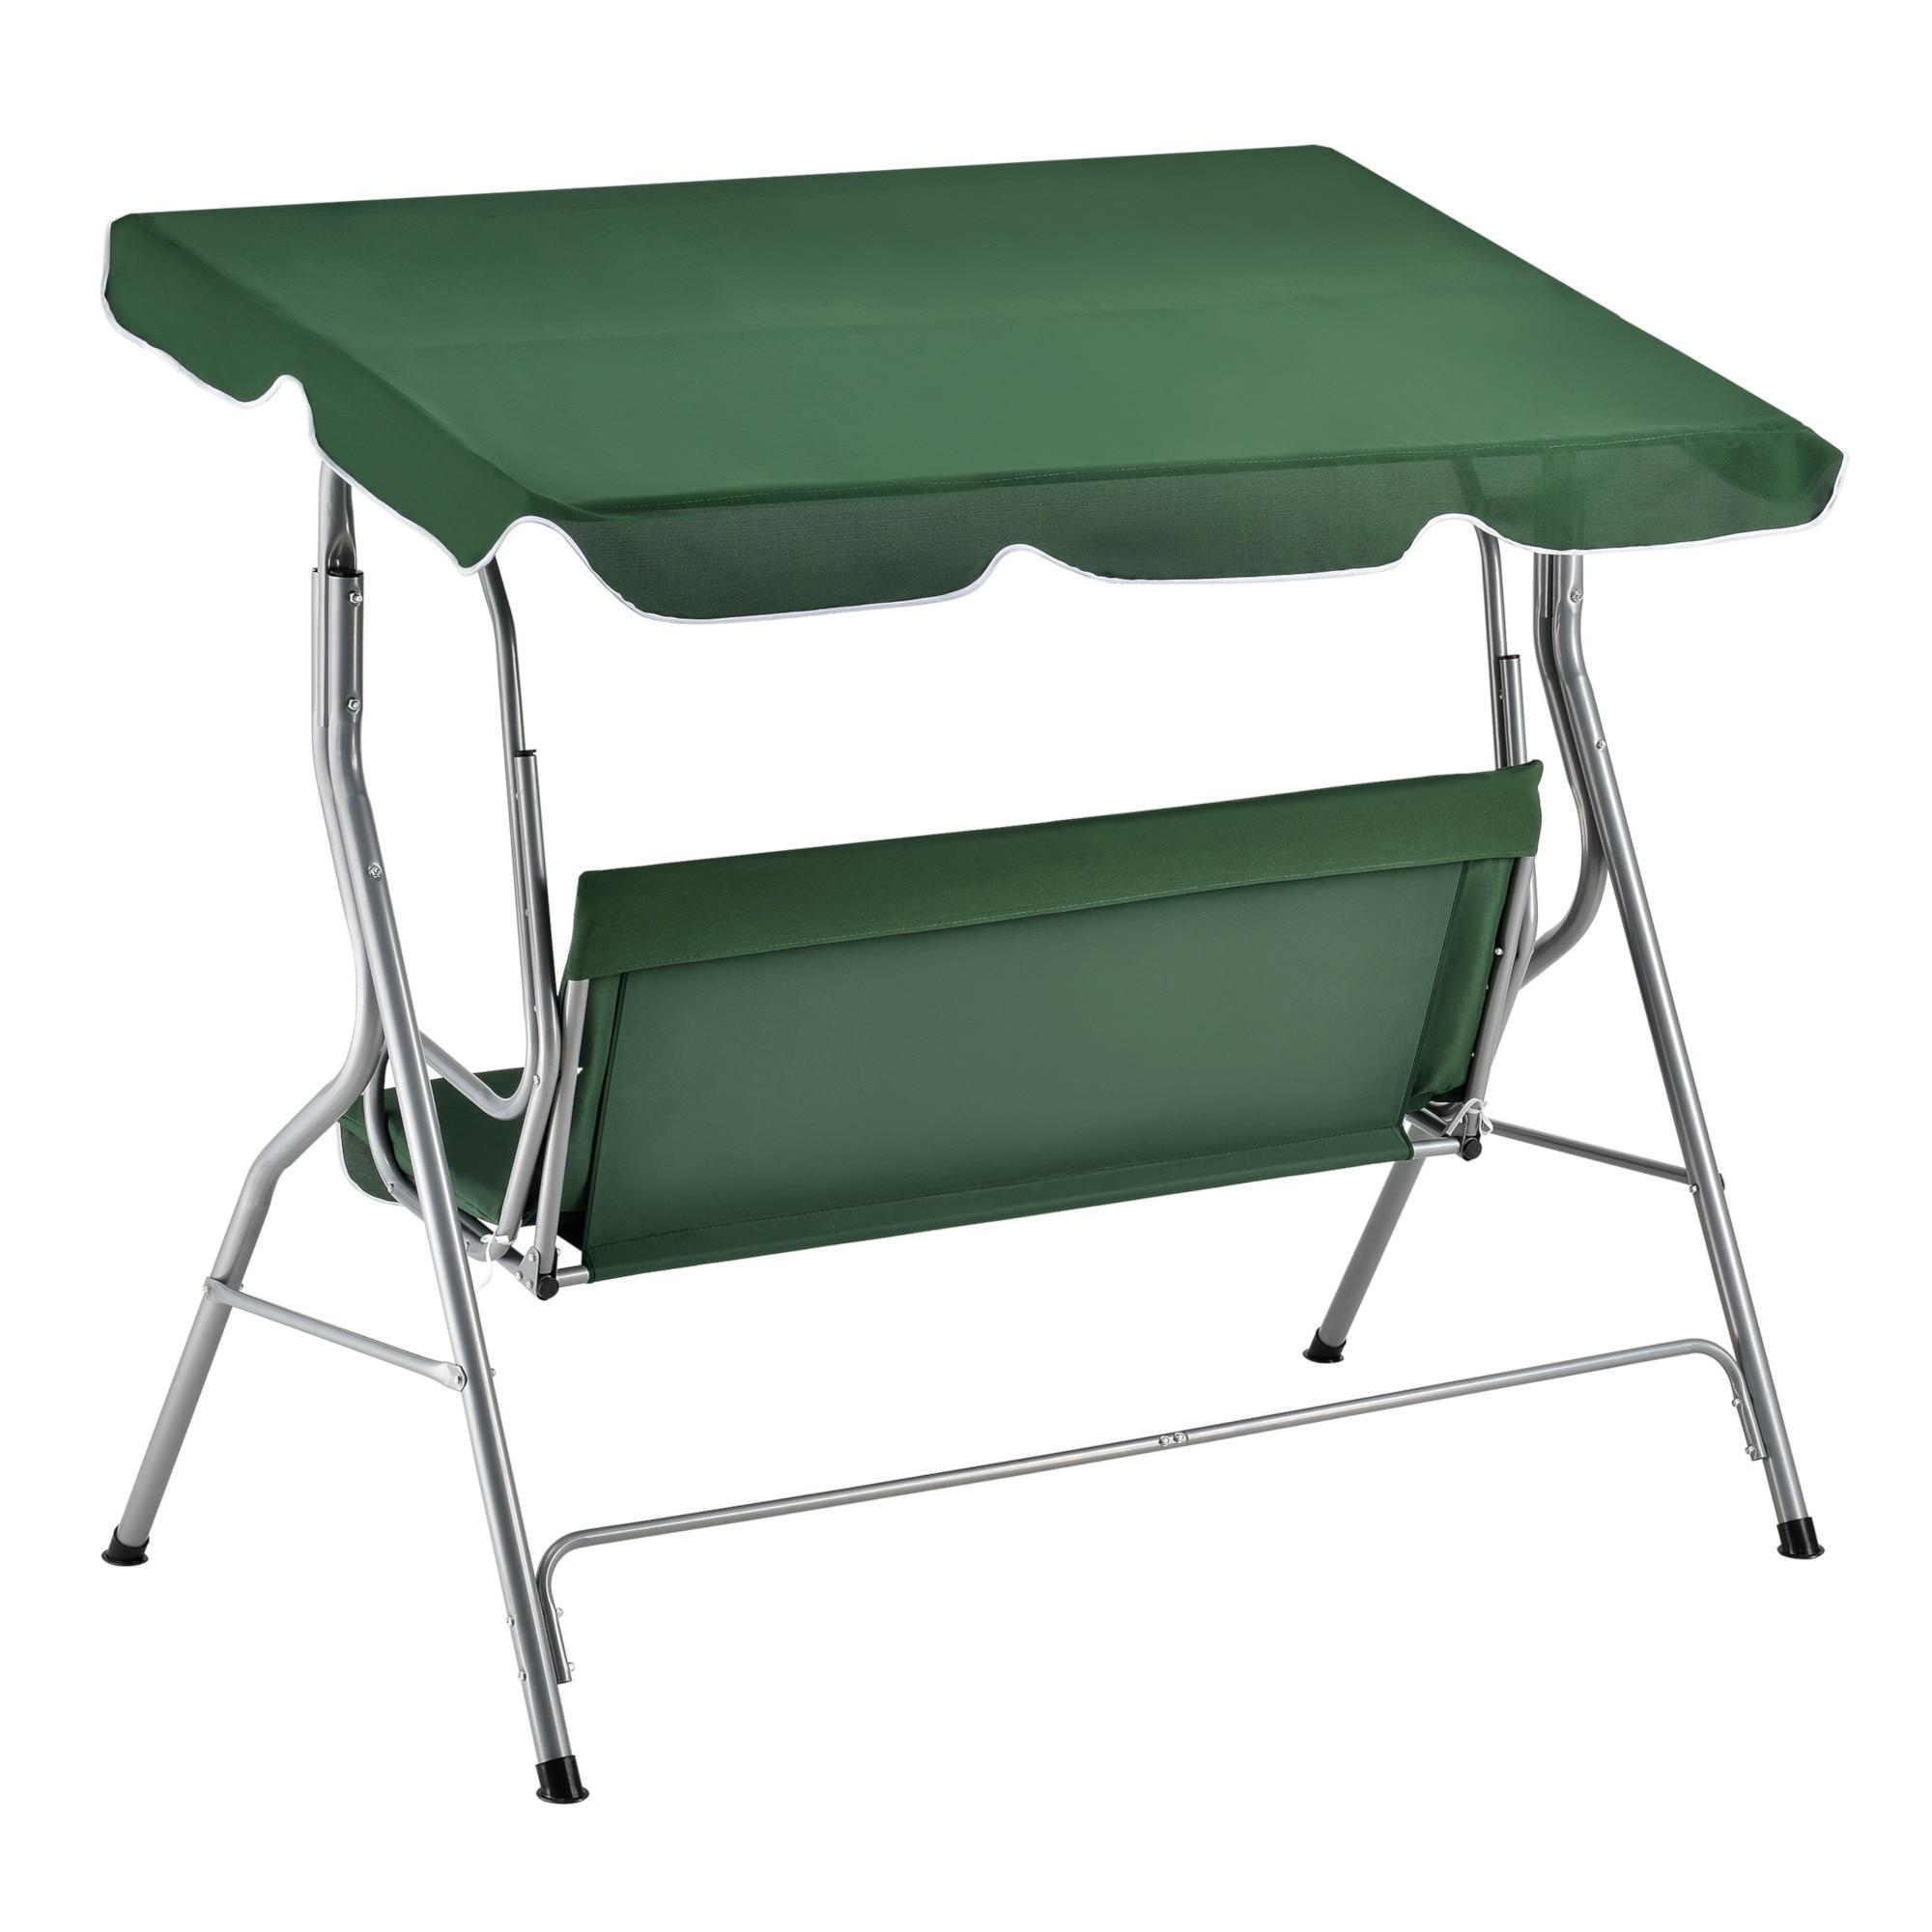 Balansoar Gradina Tina Casa Pro 170 X 110 X 153 Cm Metal Textil Verde Inchis Emag Ro